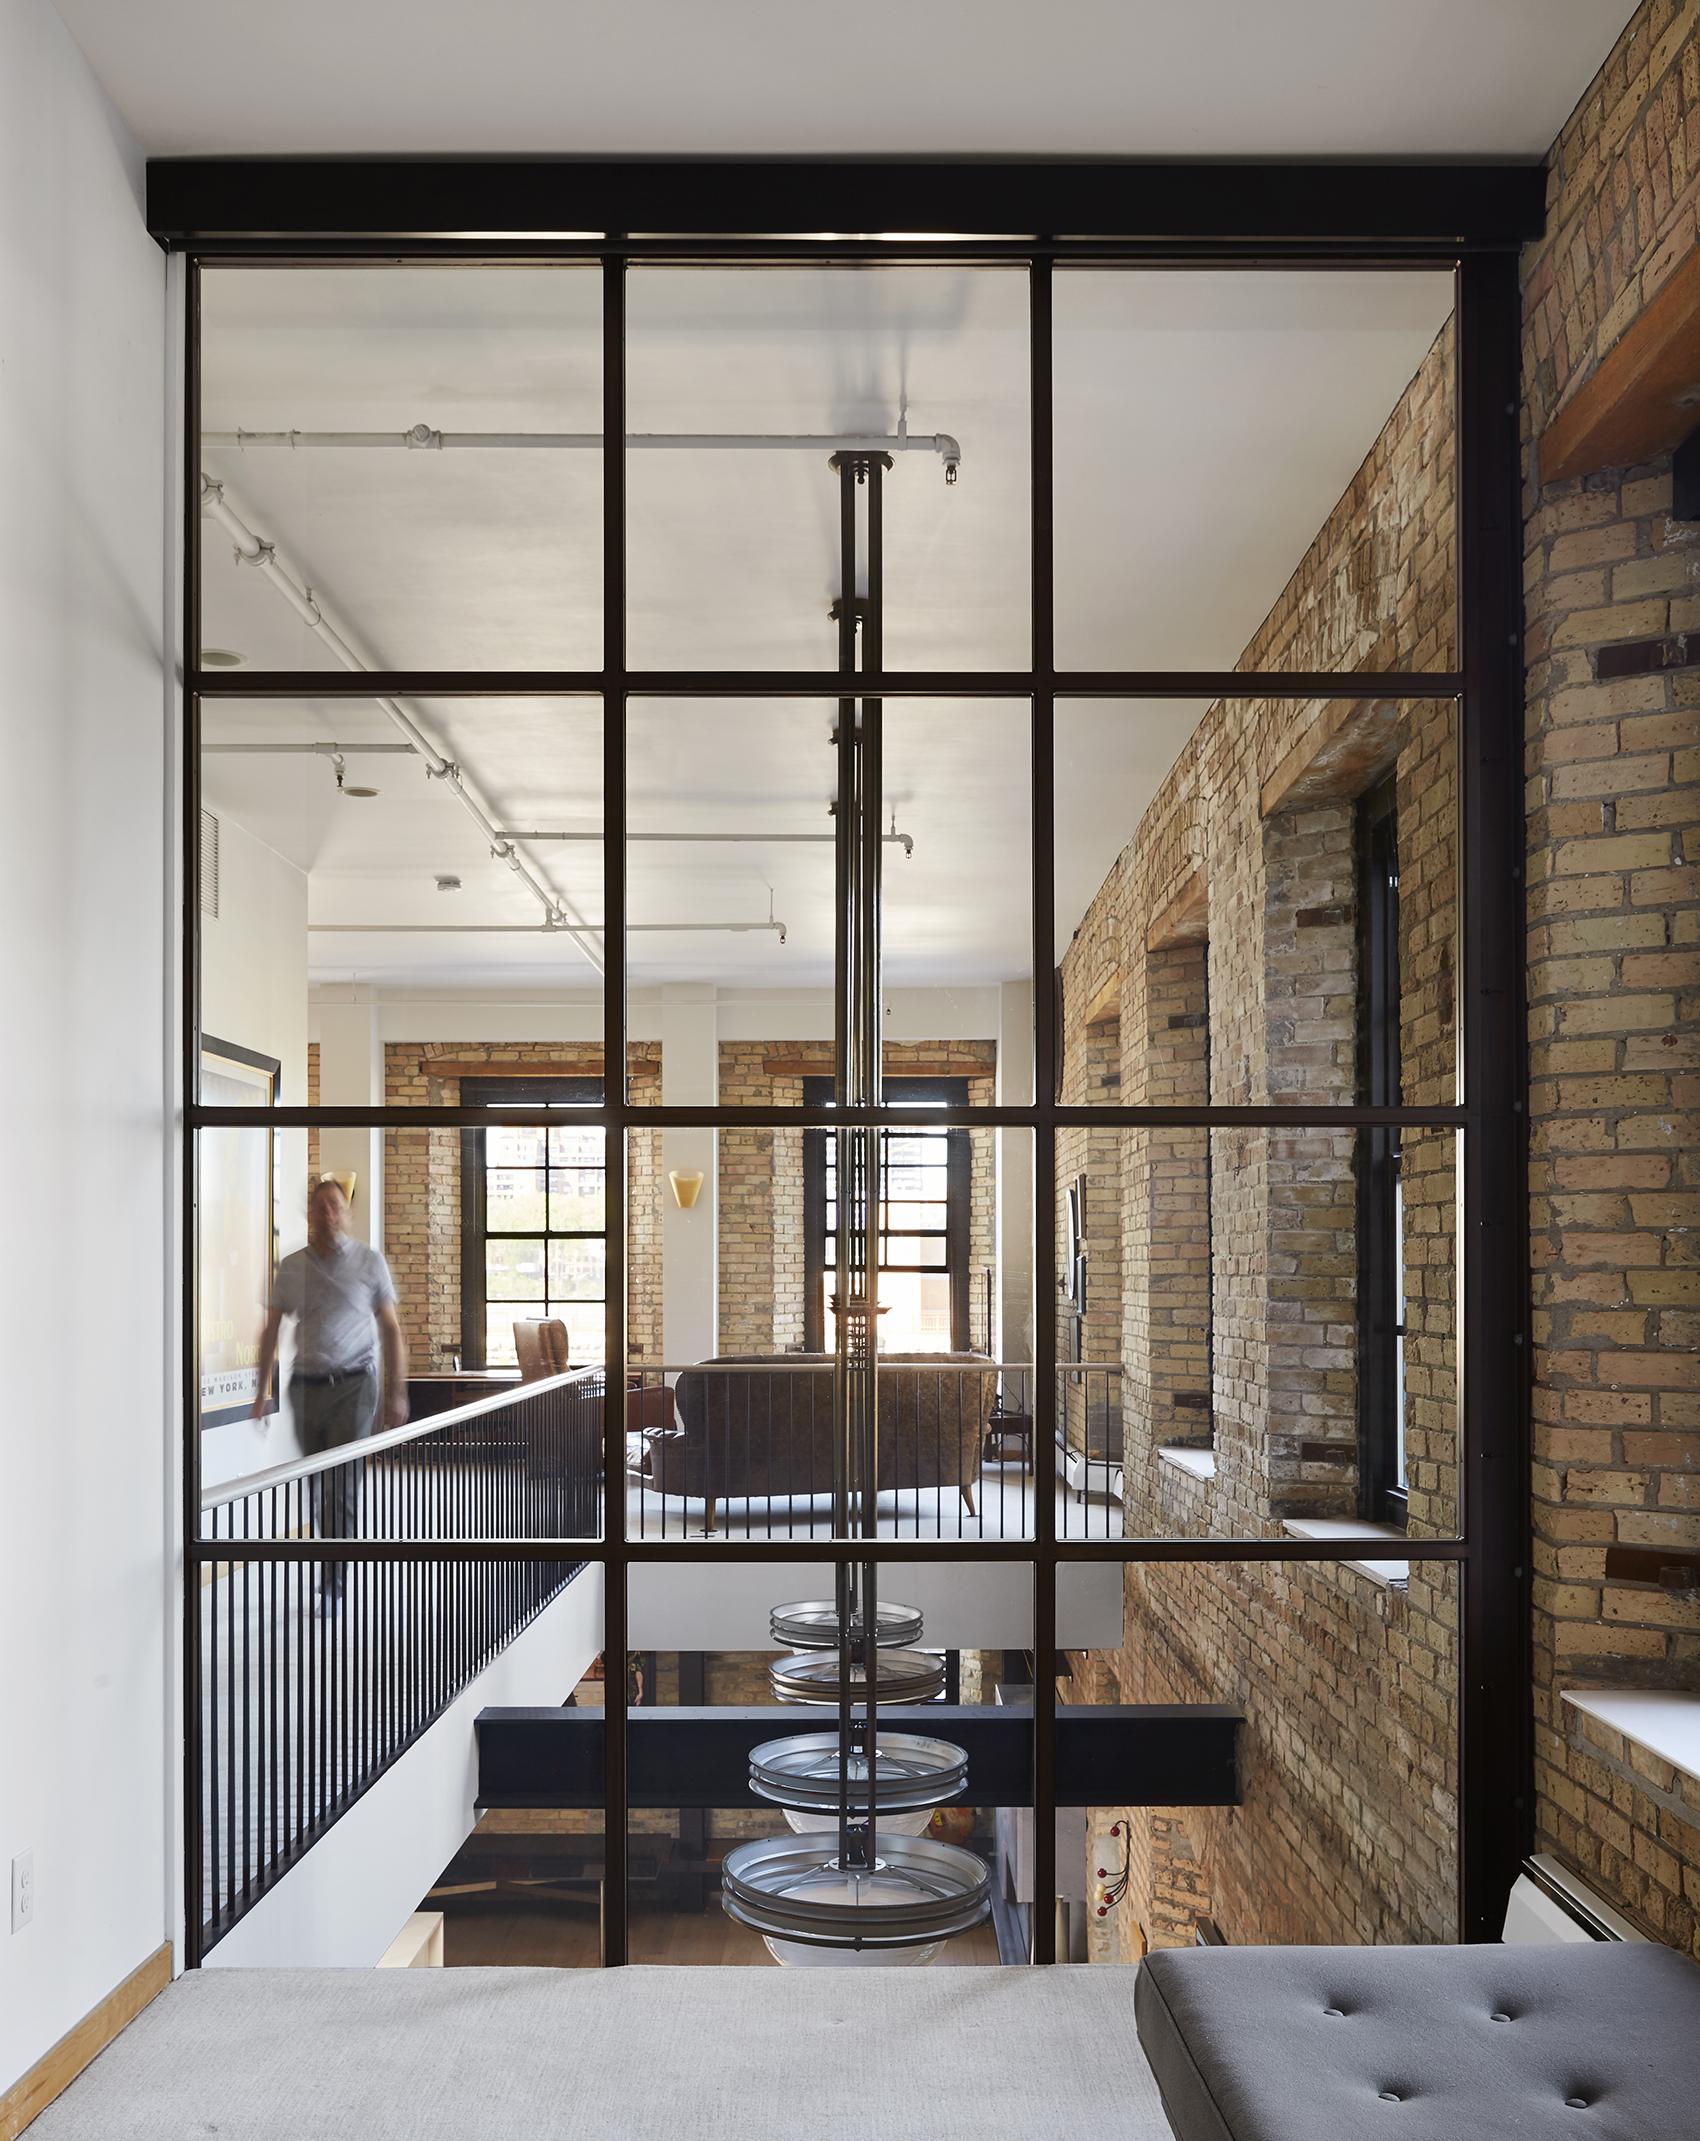 bauer metal fabrication architectural metalwork minnesota mn18.jpg